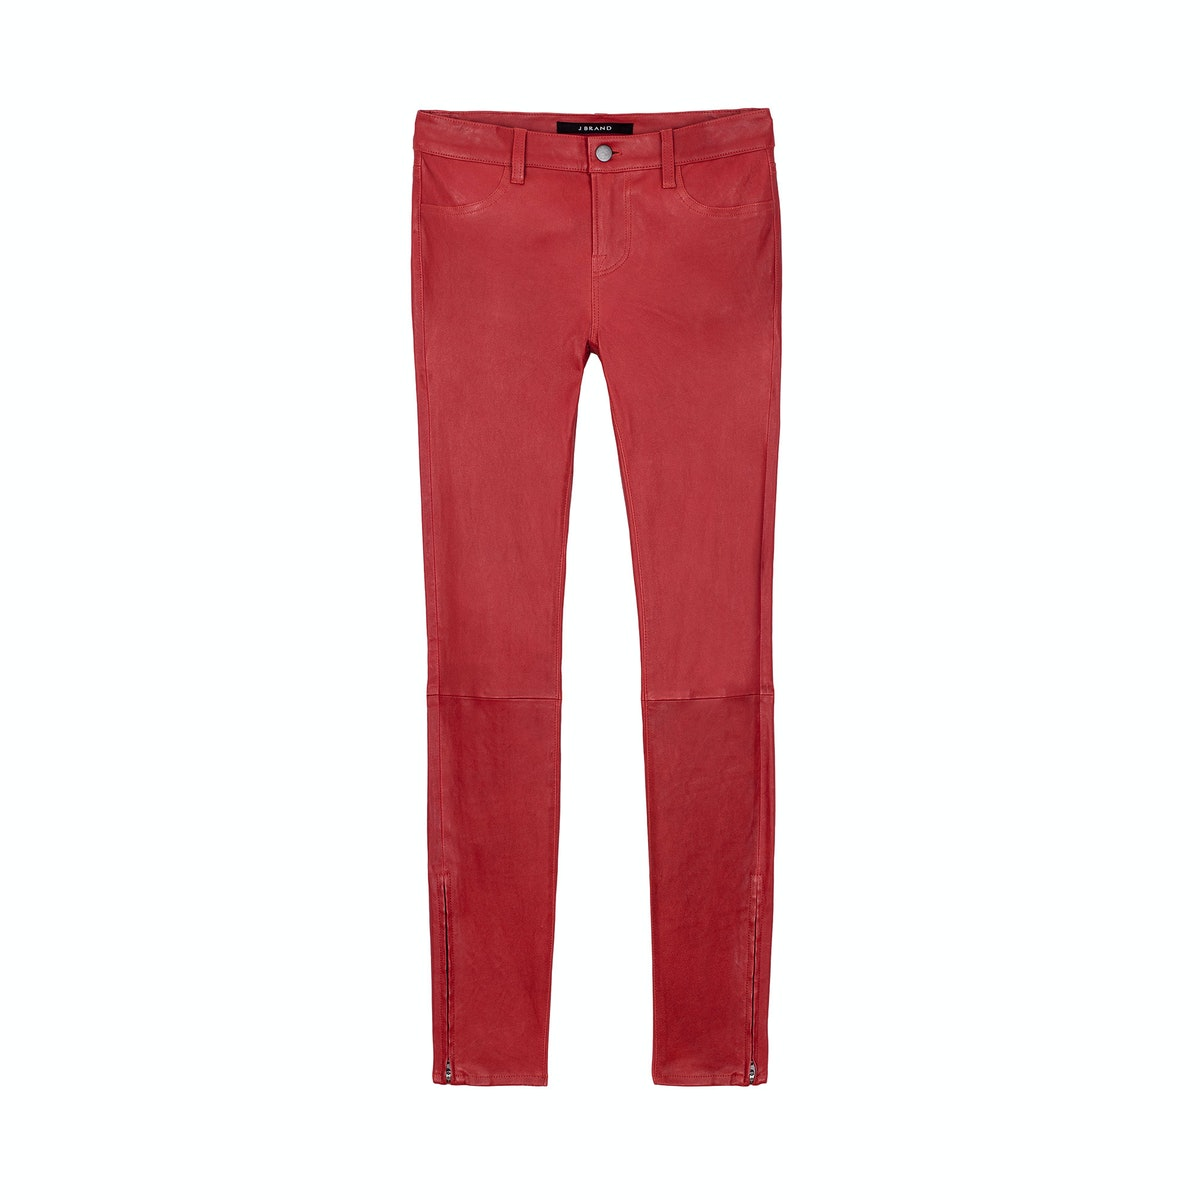 J.Brand leather pants